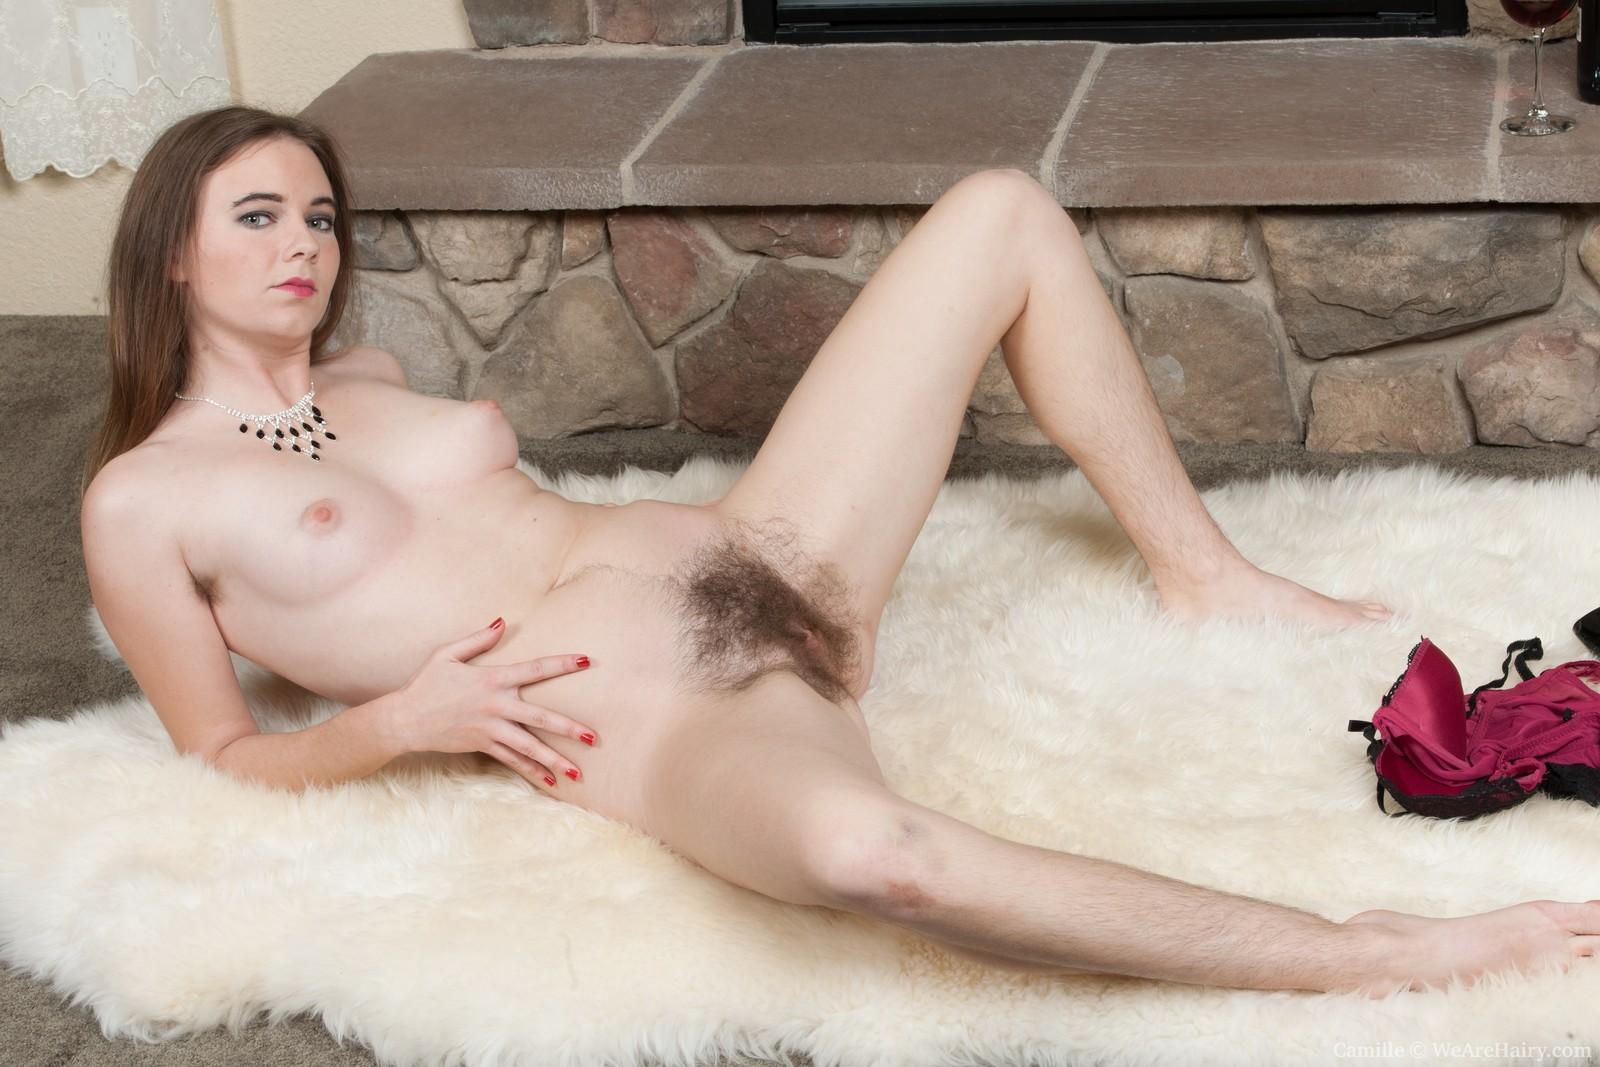 xxx videos naked redheadedwomen